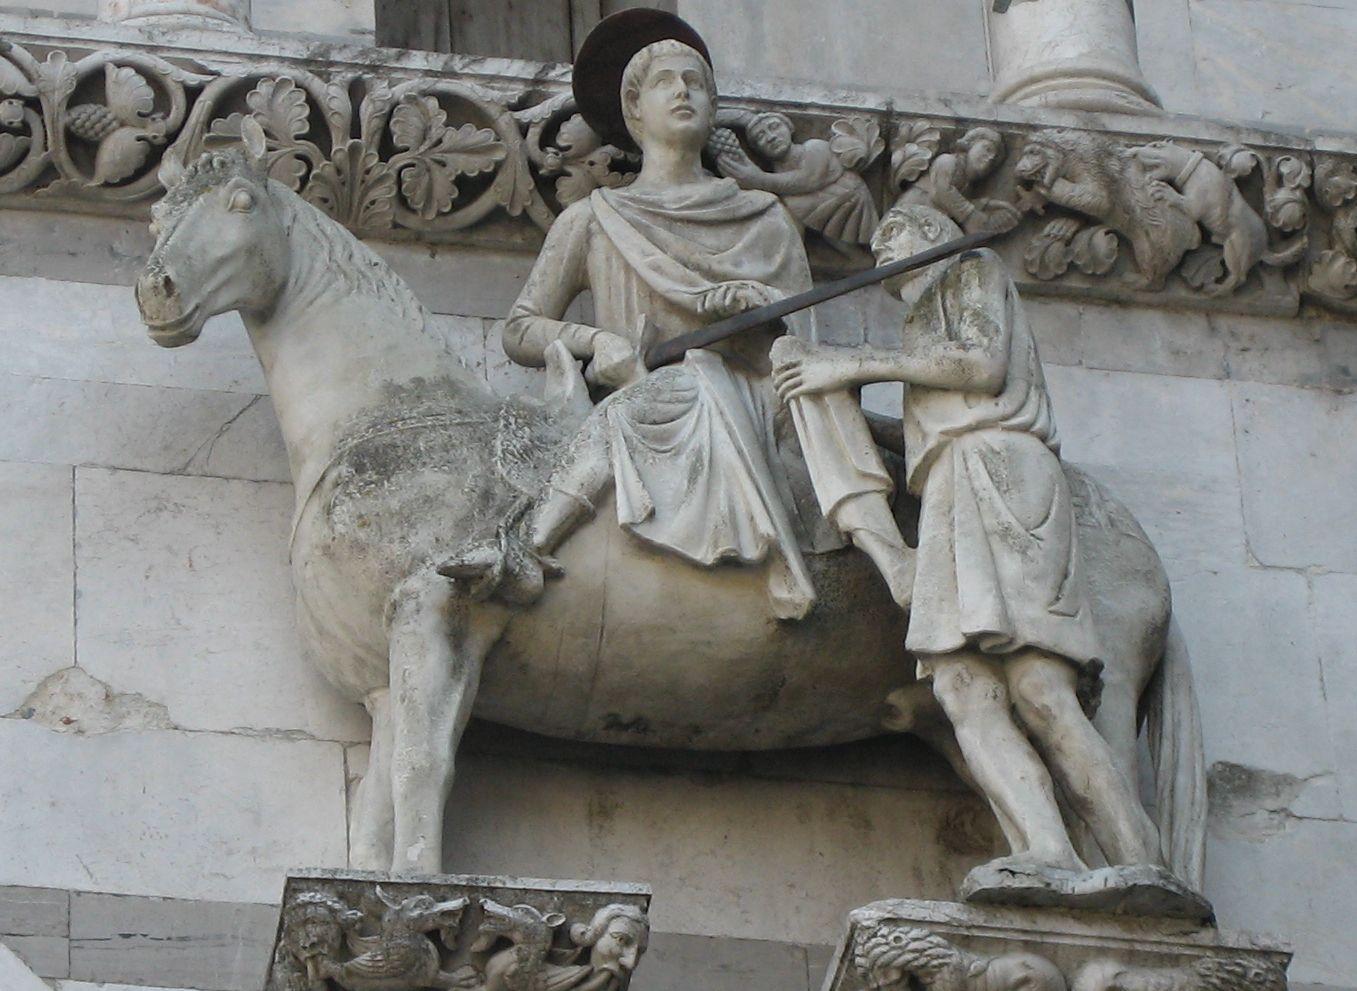 Saint Martin at Duomo of Lucca